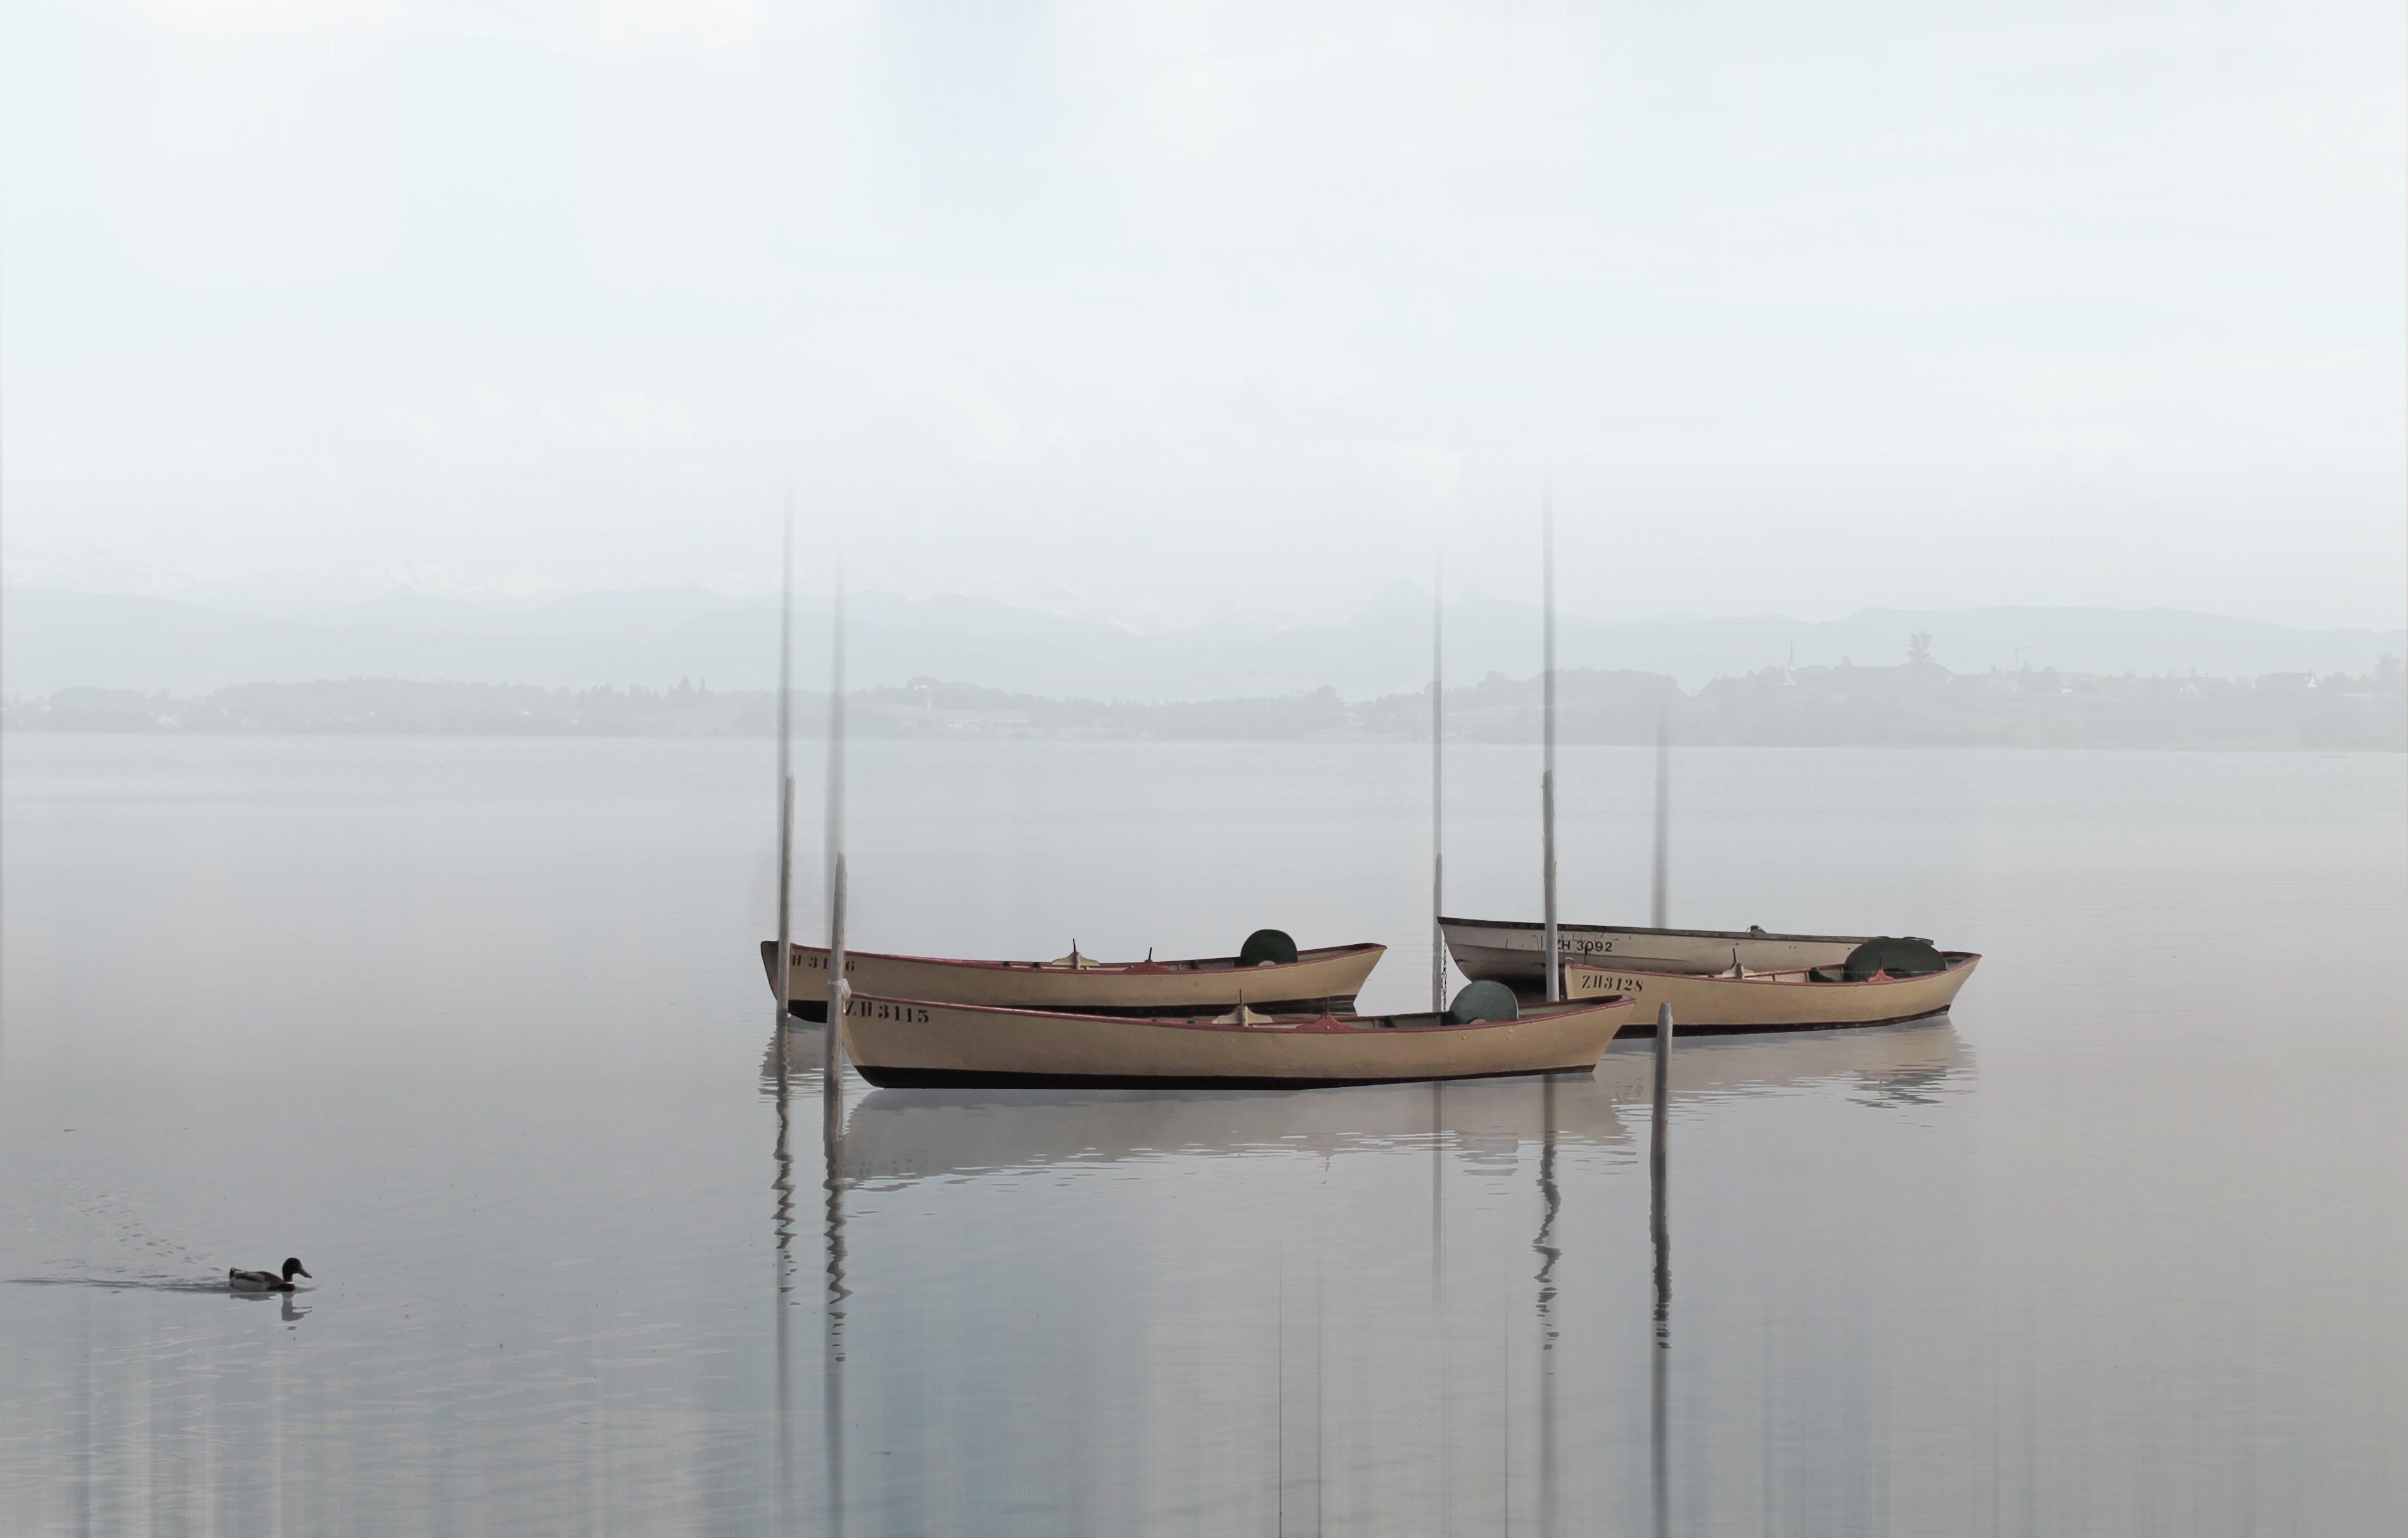 4 White Canoe on Calm Body of Water